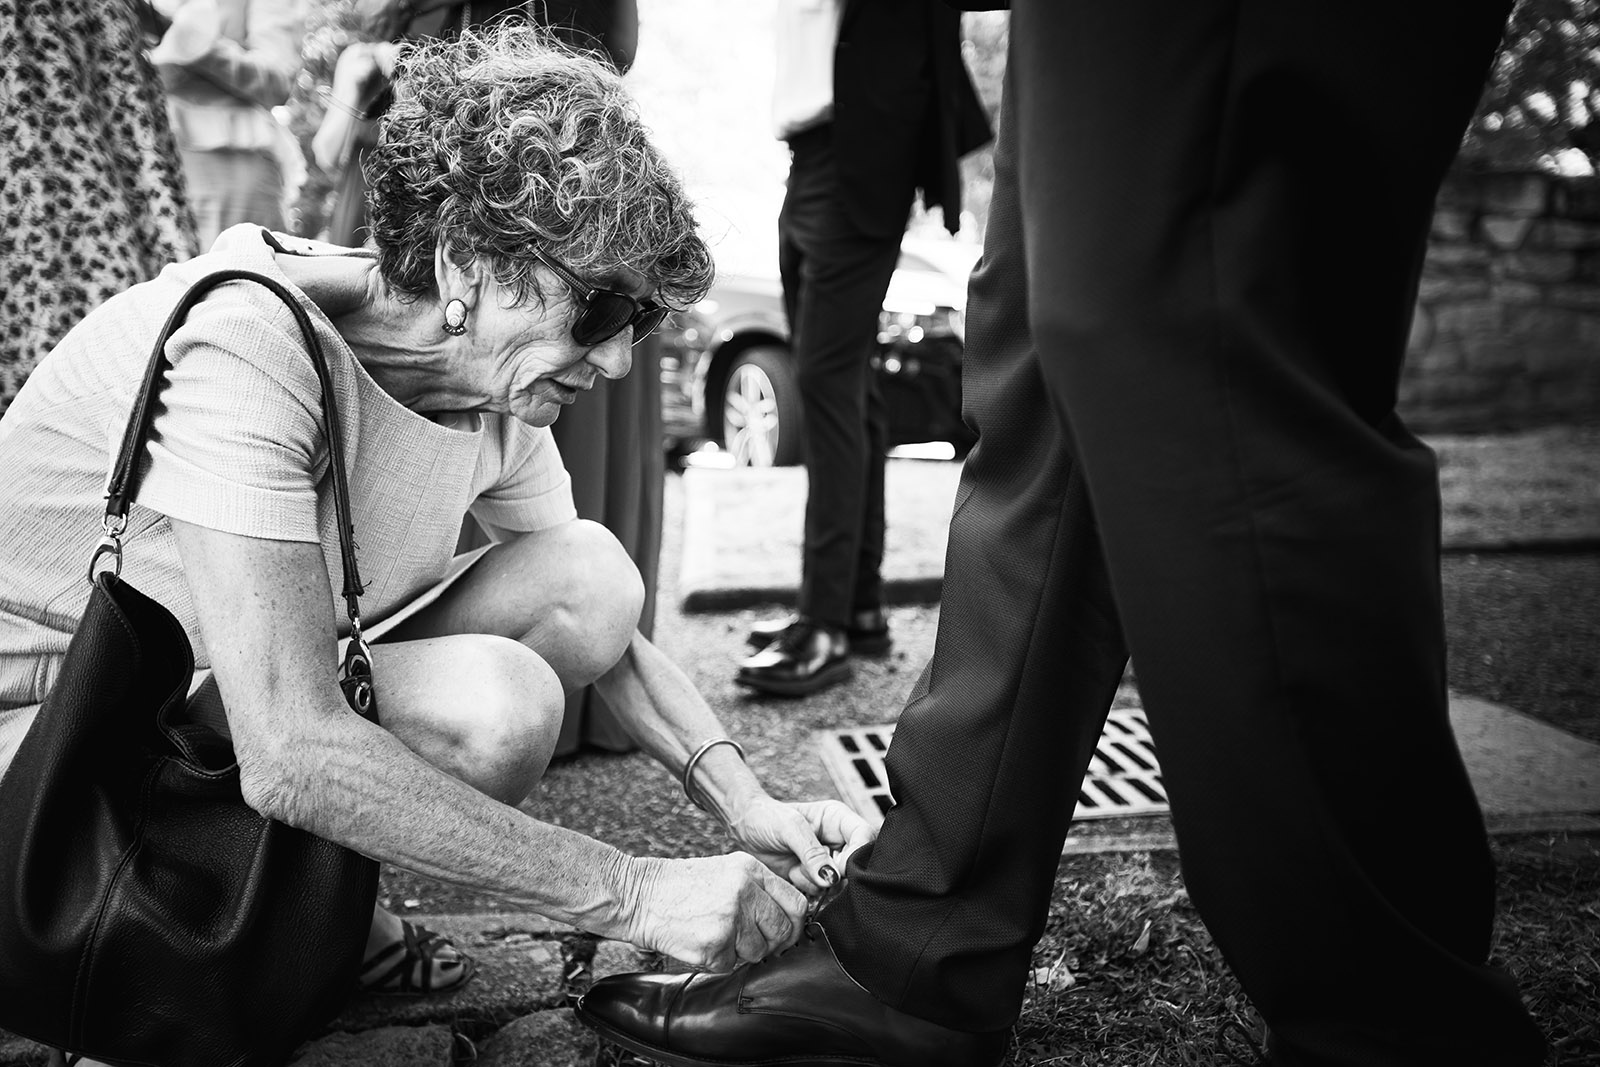 photographe-mariage-reportage-wedding-photographer-ceremonie-anse-domaine-de-benevent-beaujolais-elise-julliard-lyon-auvergne-rhone-alpes-3